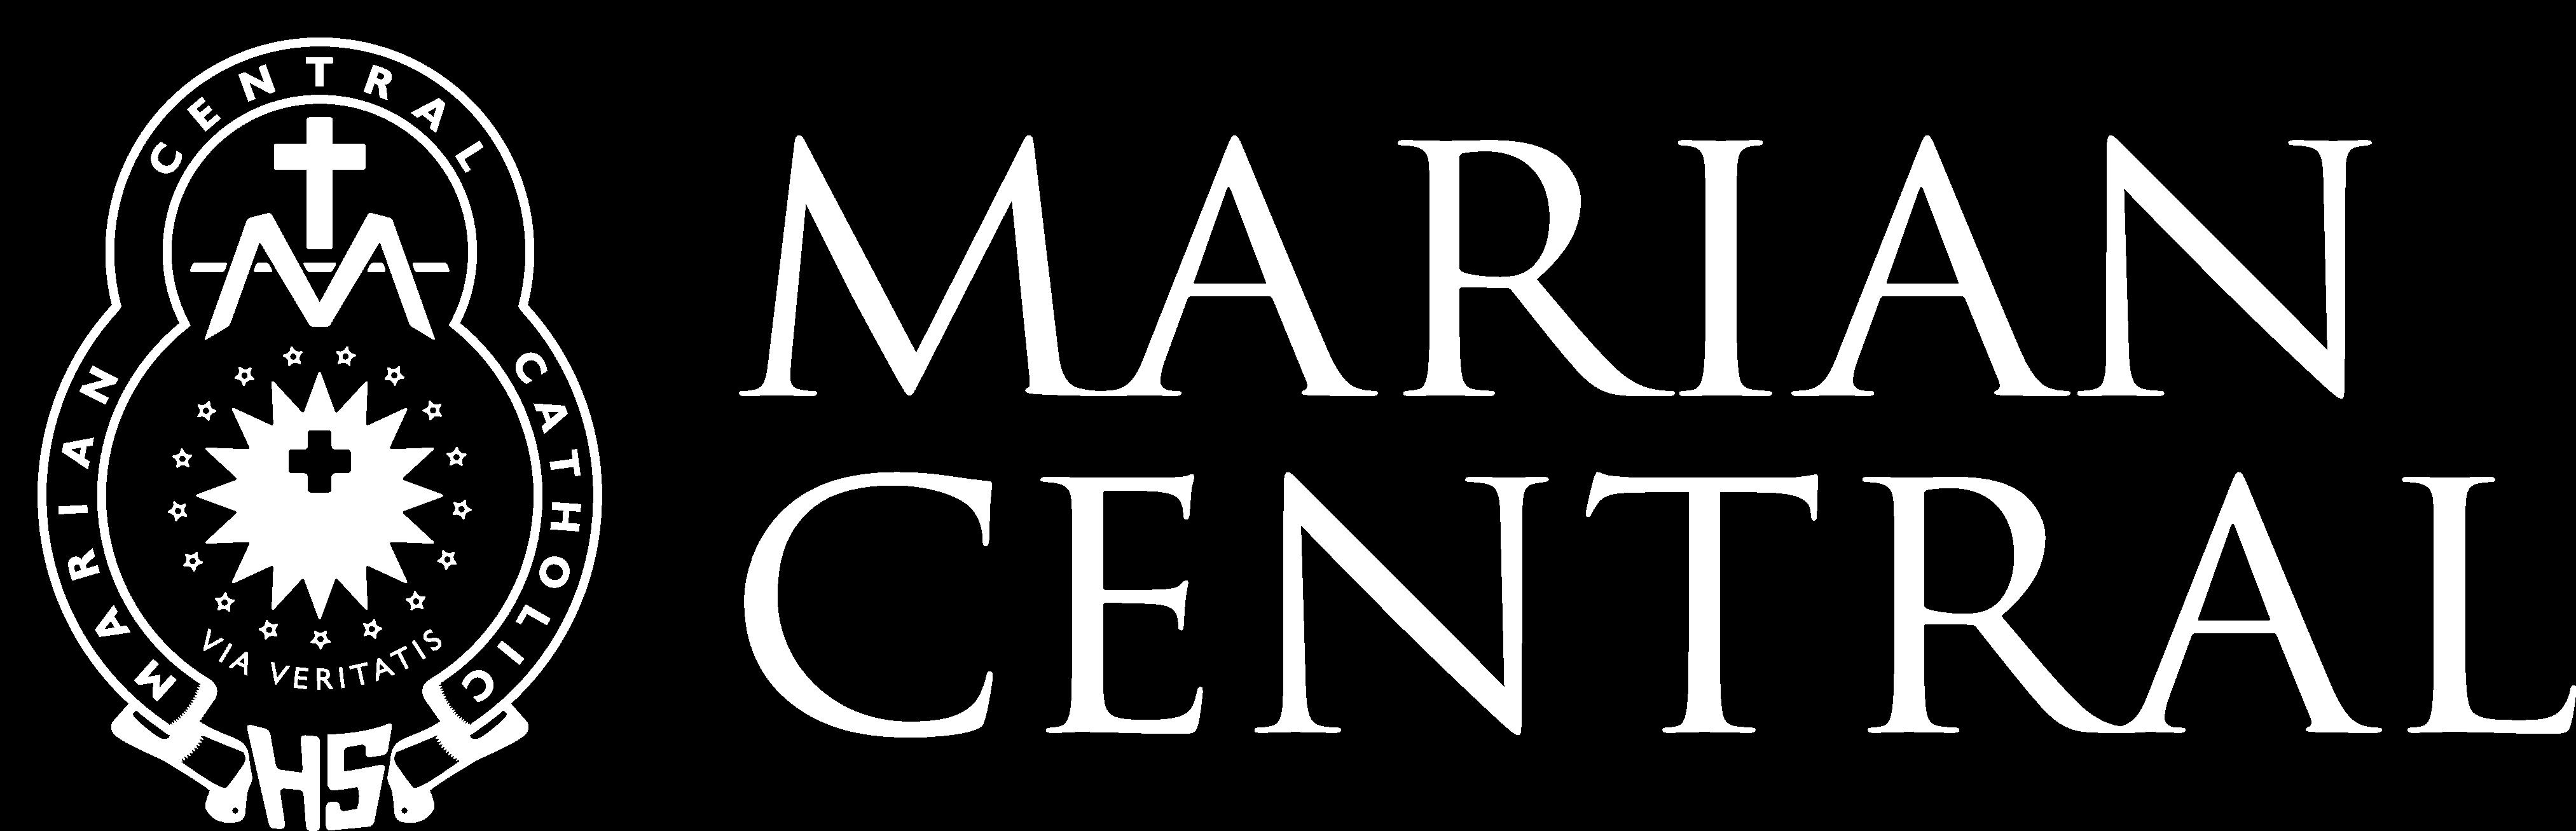 Marian Central Catholic High School Creating A Community Of Focus